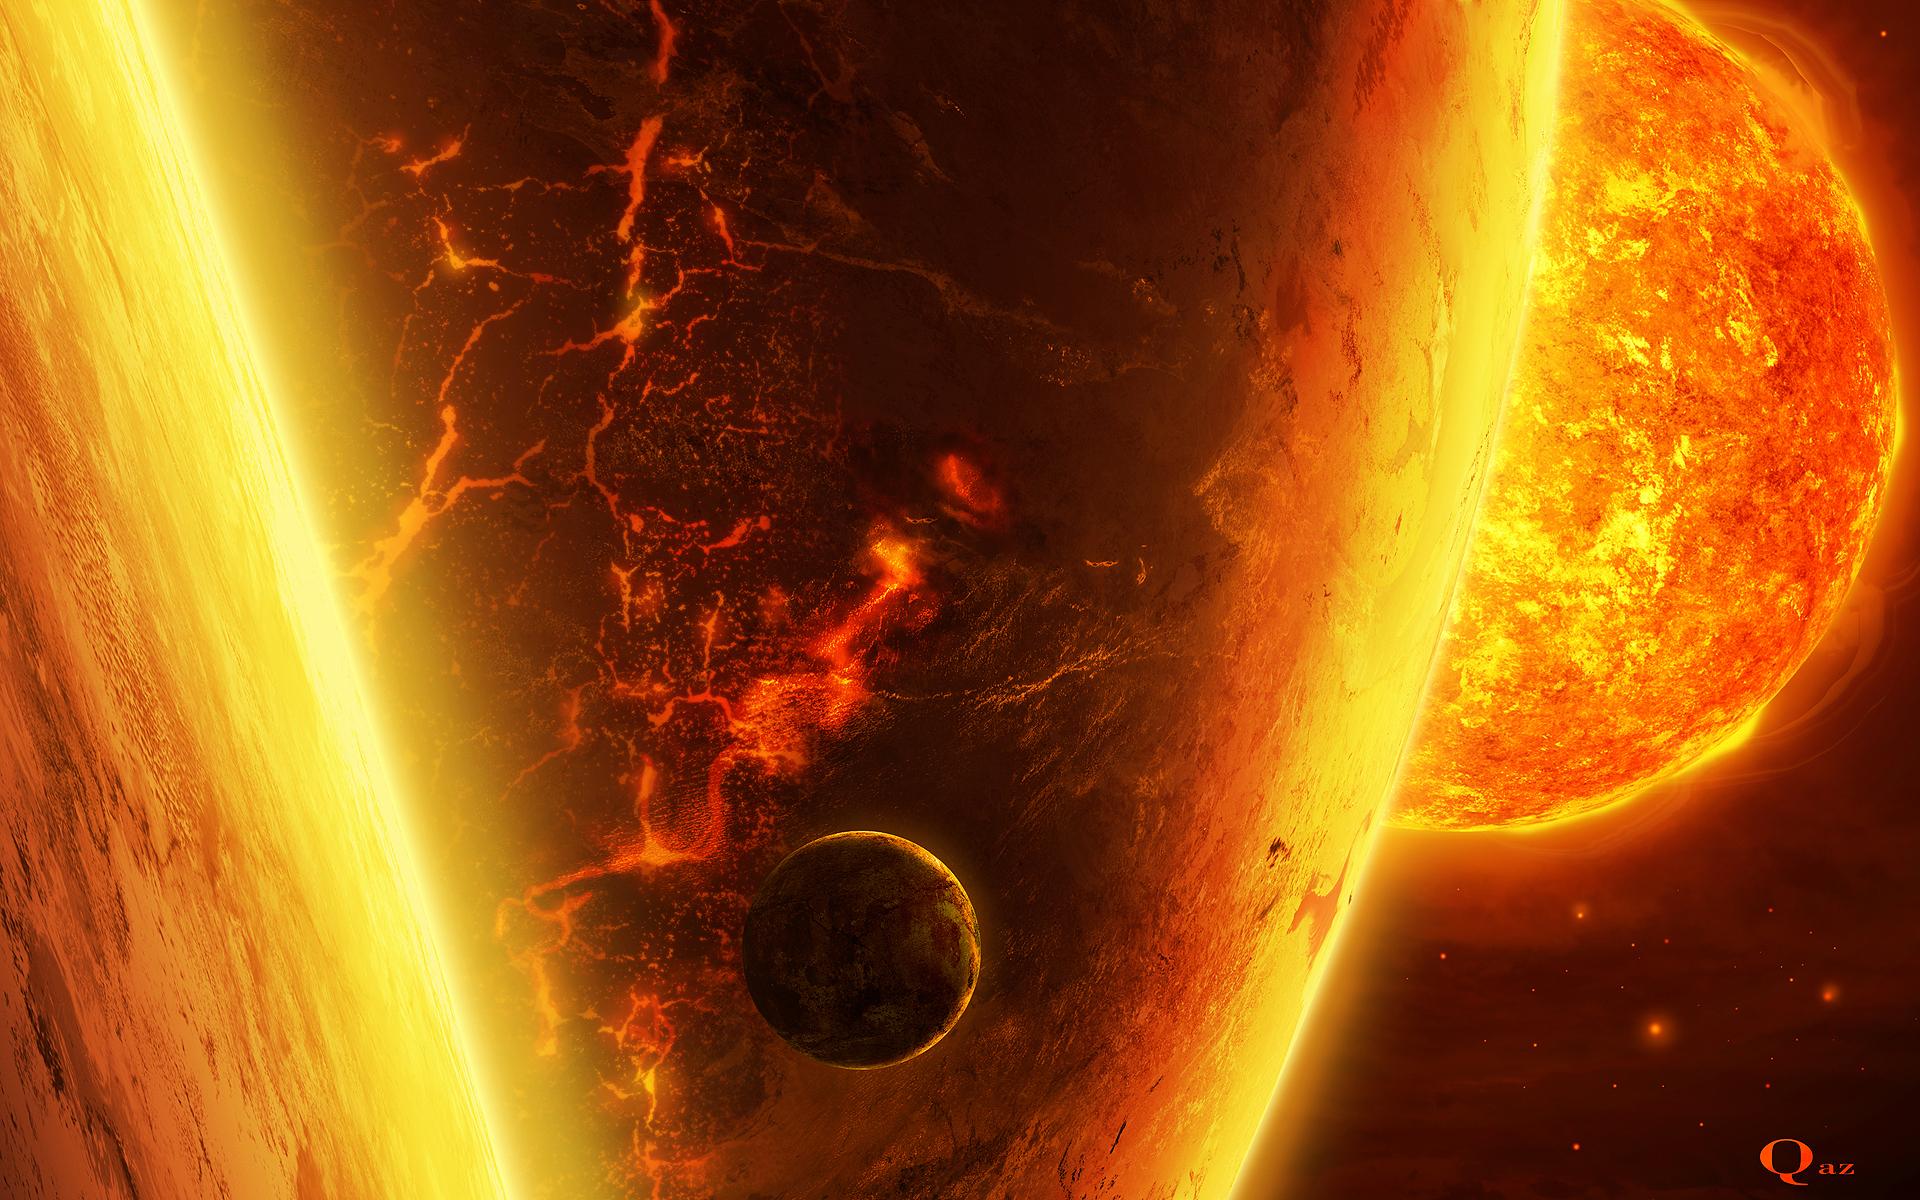 planets surrounding the sun - HD1920×1200